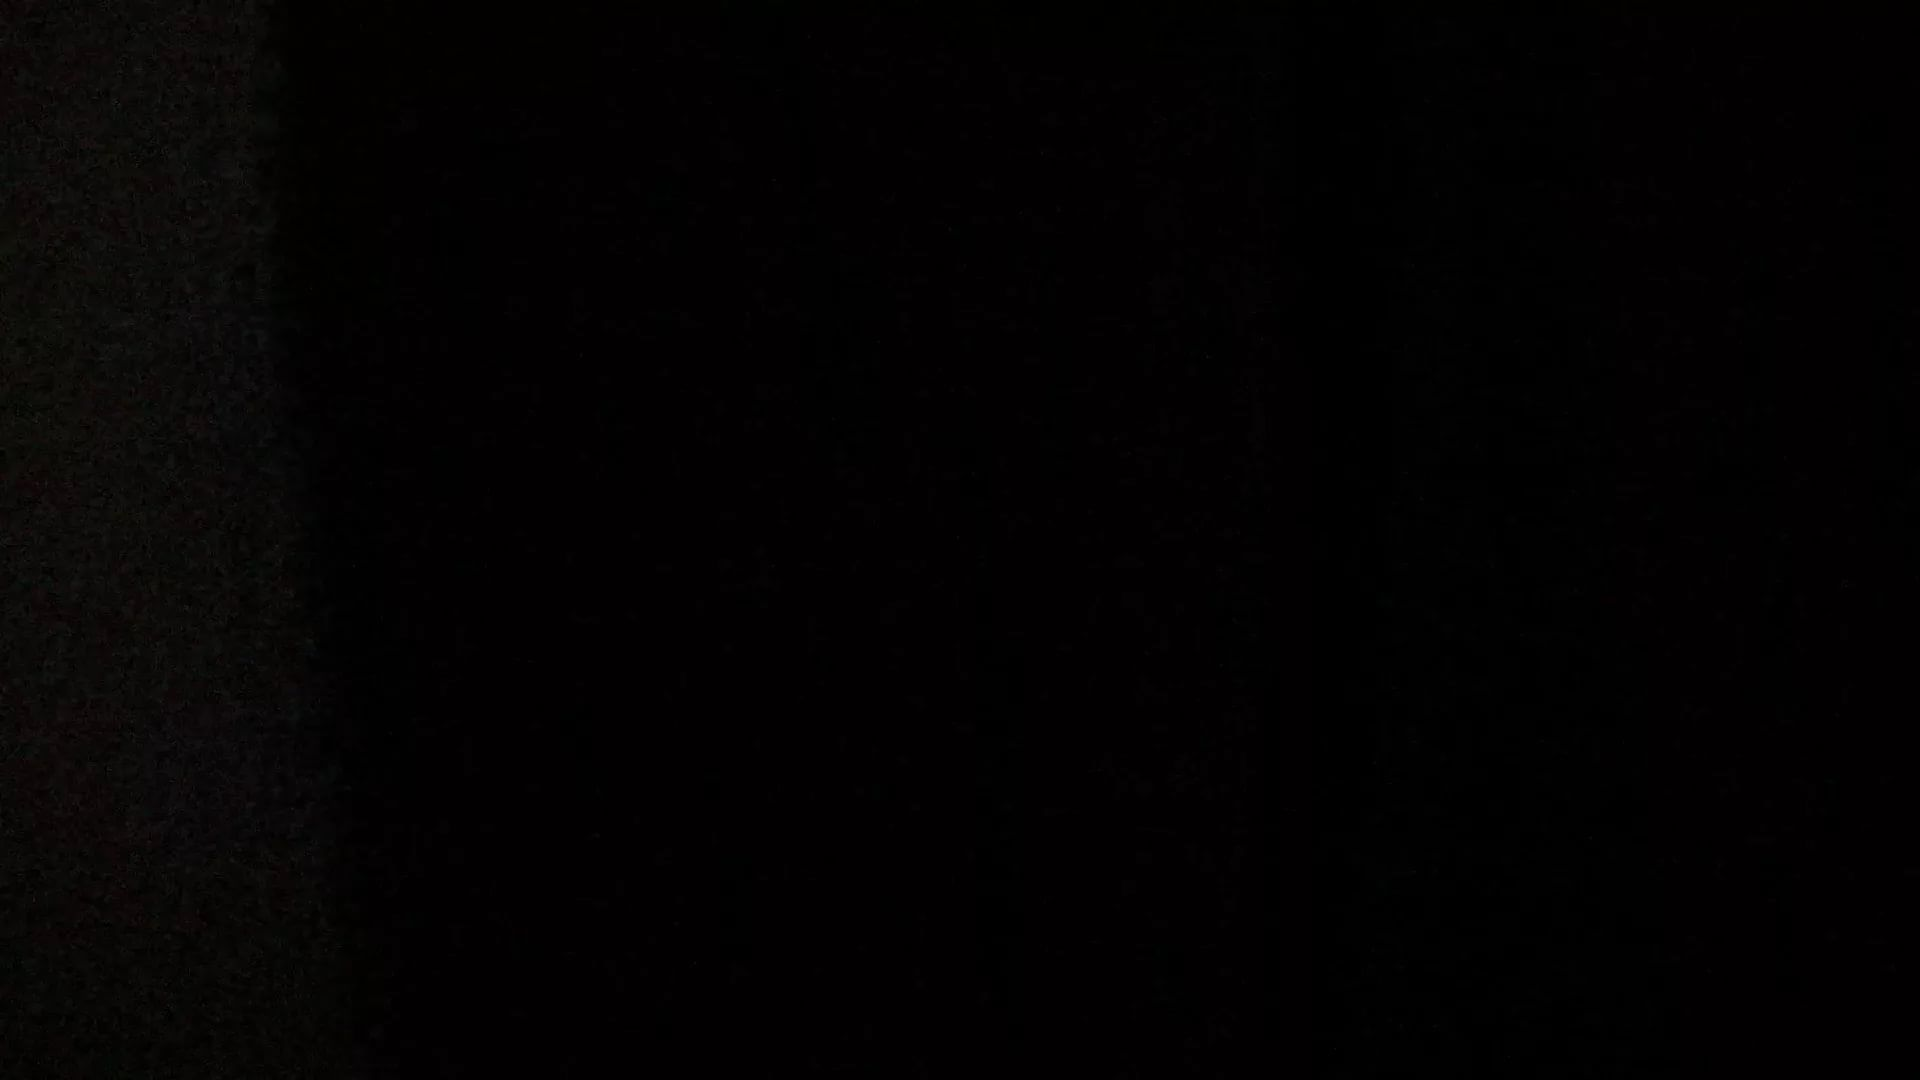 Black Screen desktop wallpaper